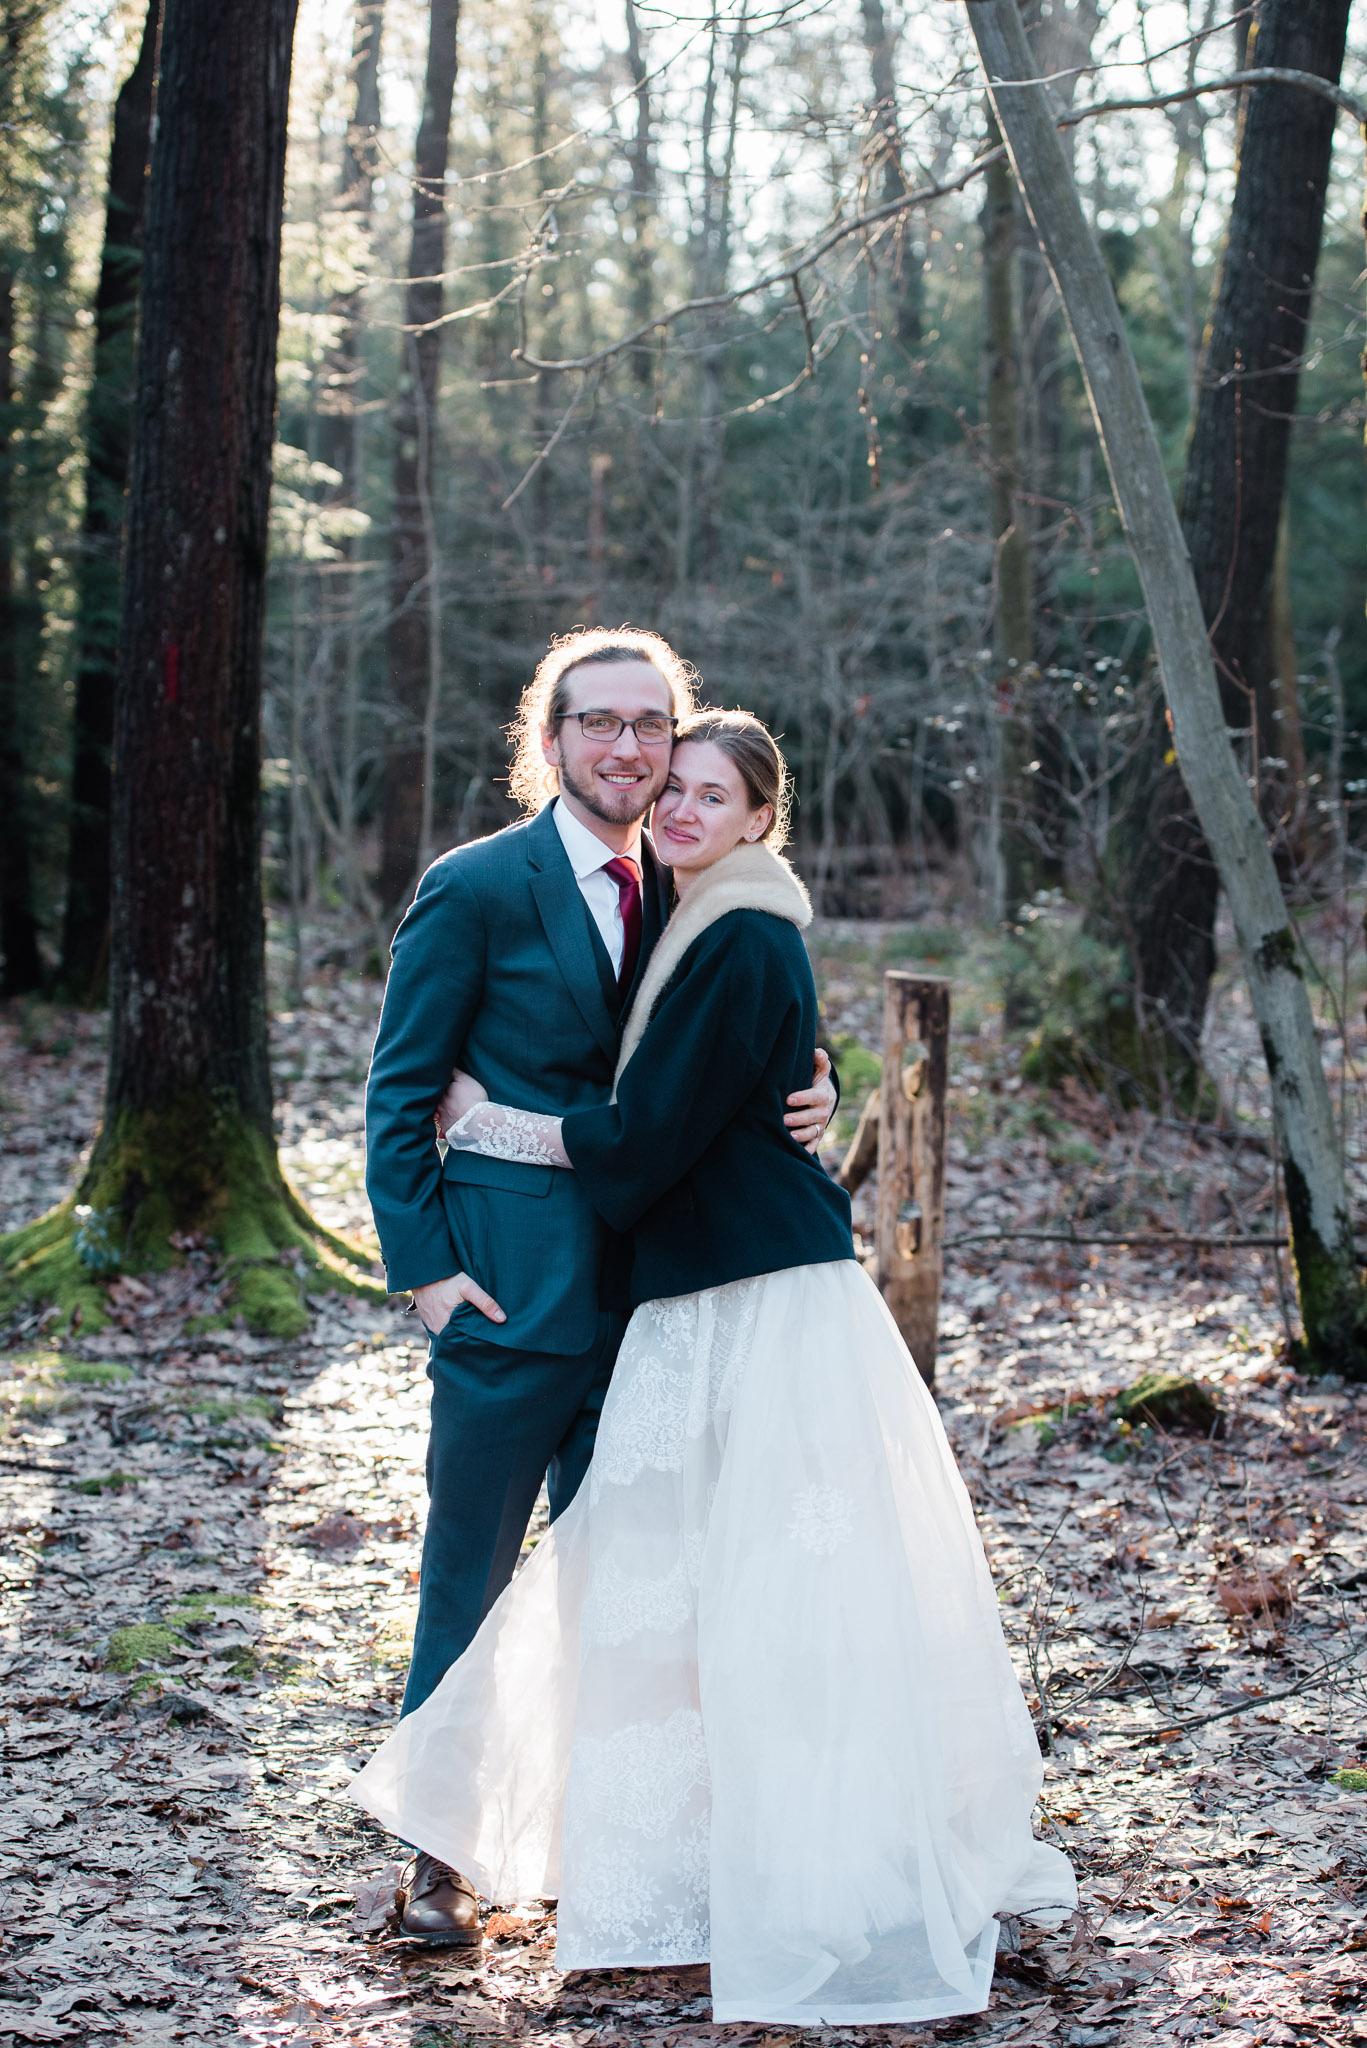 Wedding Couples portrait, Ligonier Wedding Photographer, Ligonier PA wedding, wedding potraits-1273.jpg